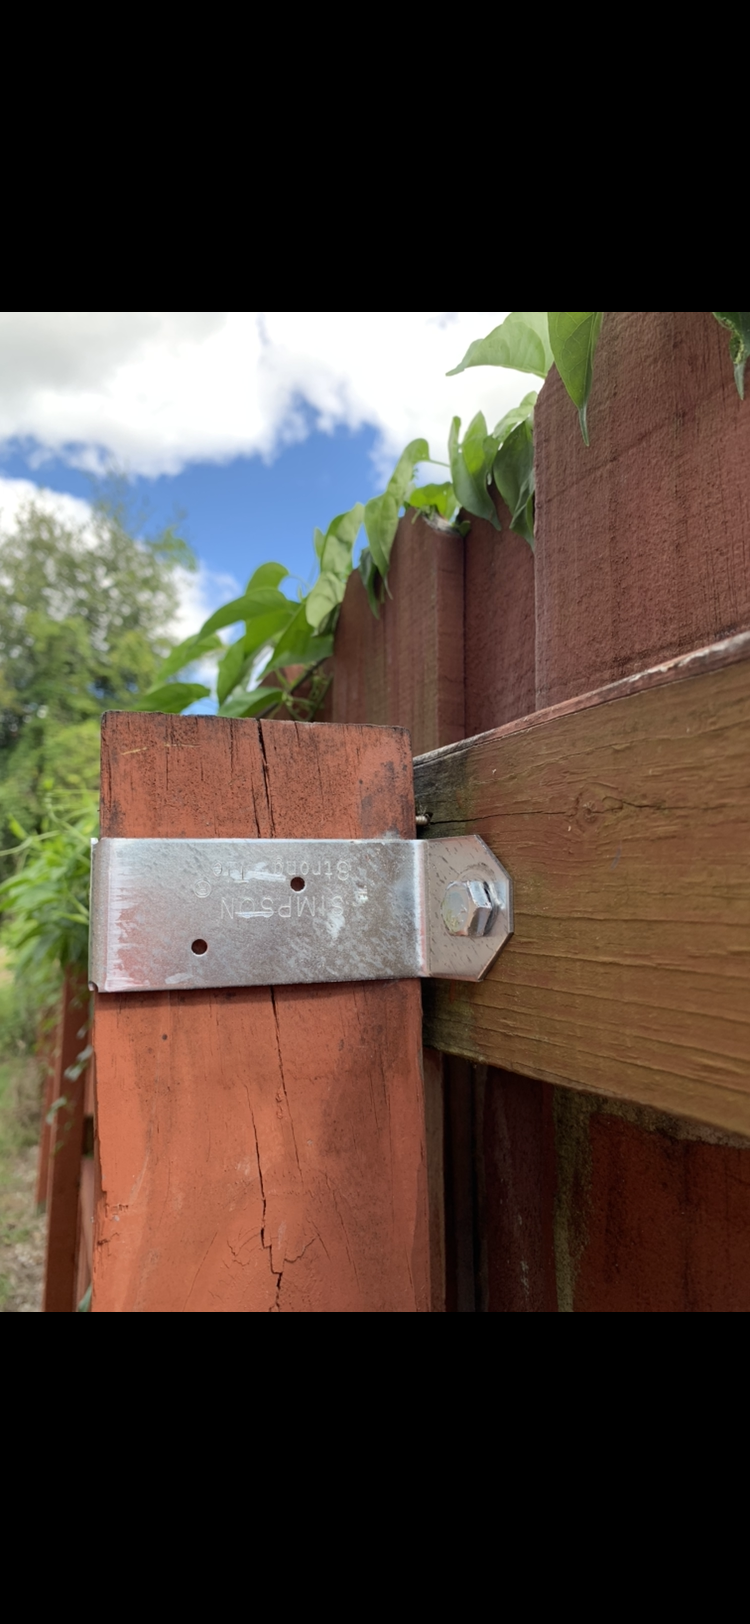 Fence ready to fall-f9849a79-32d0-49e7-9987-16aa88b2cbb5.png